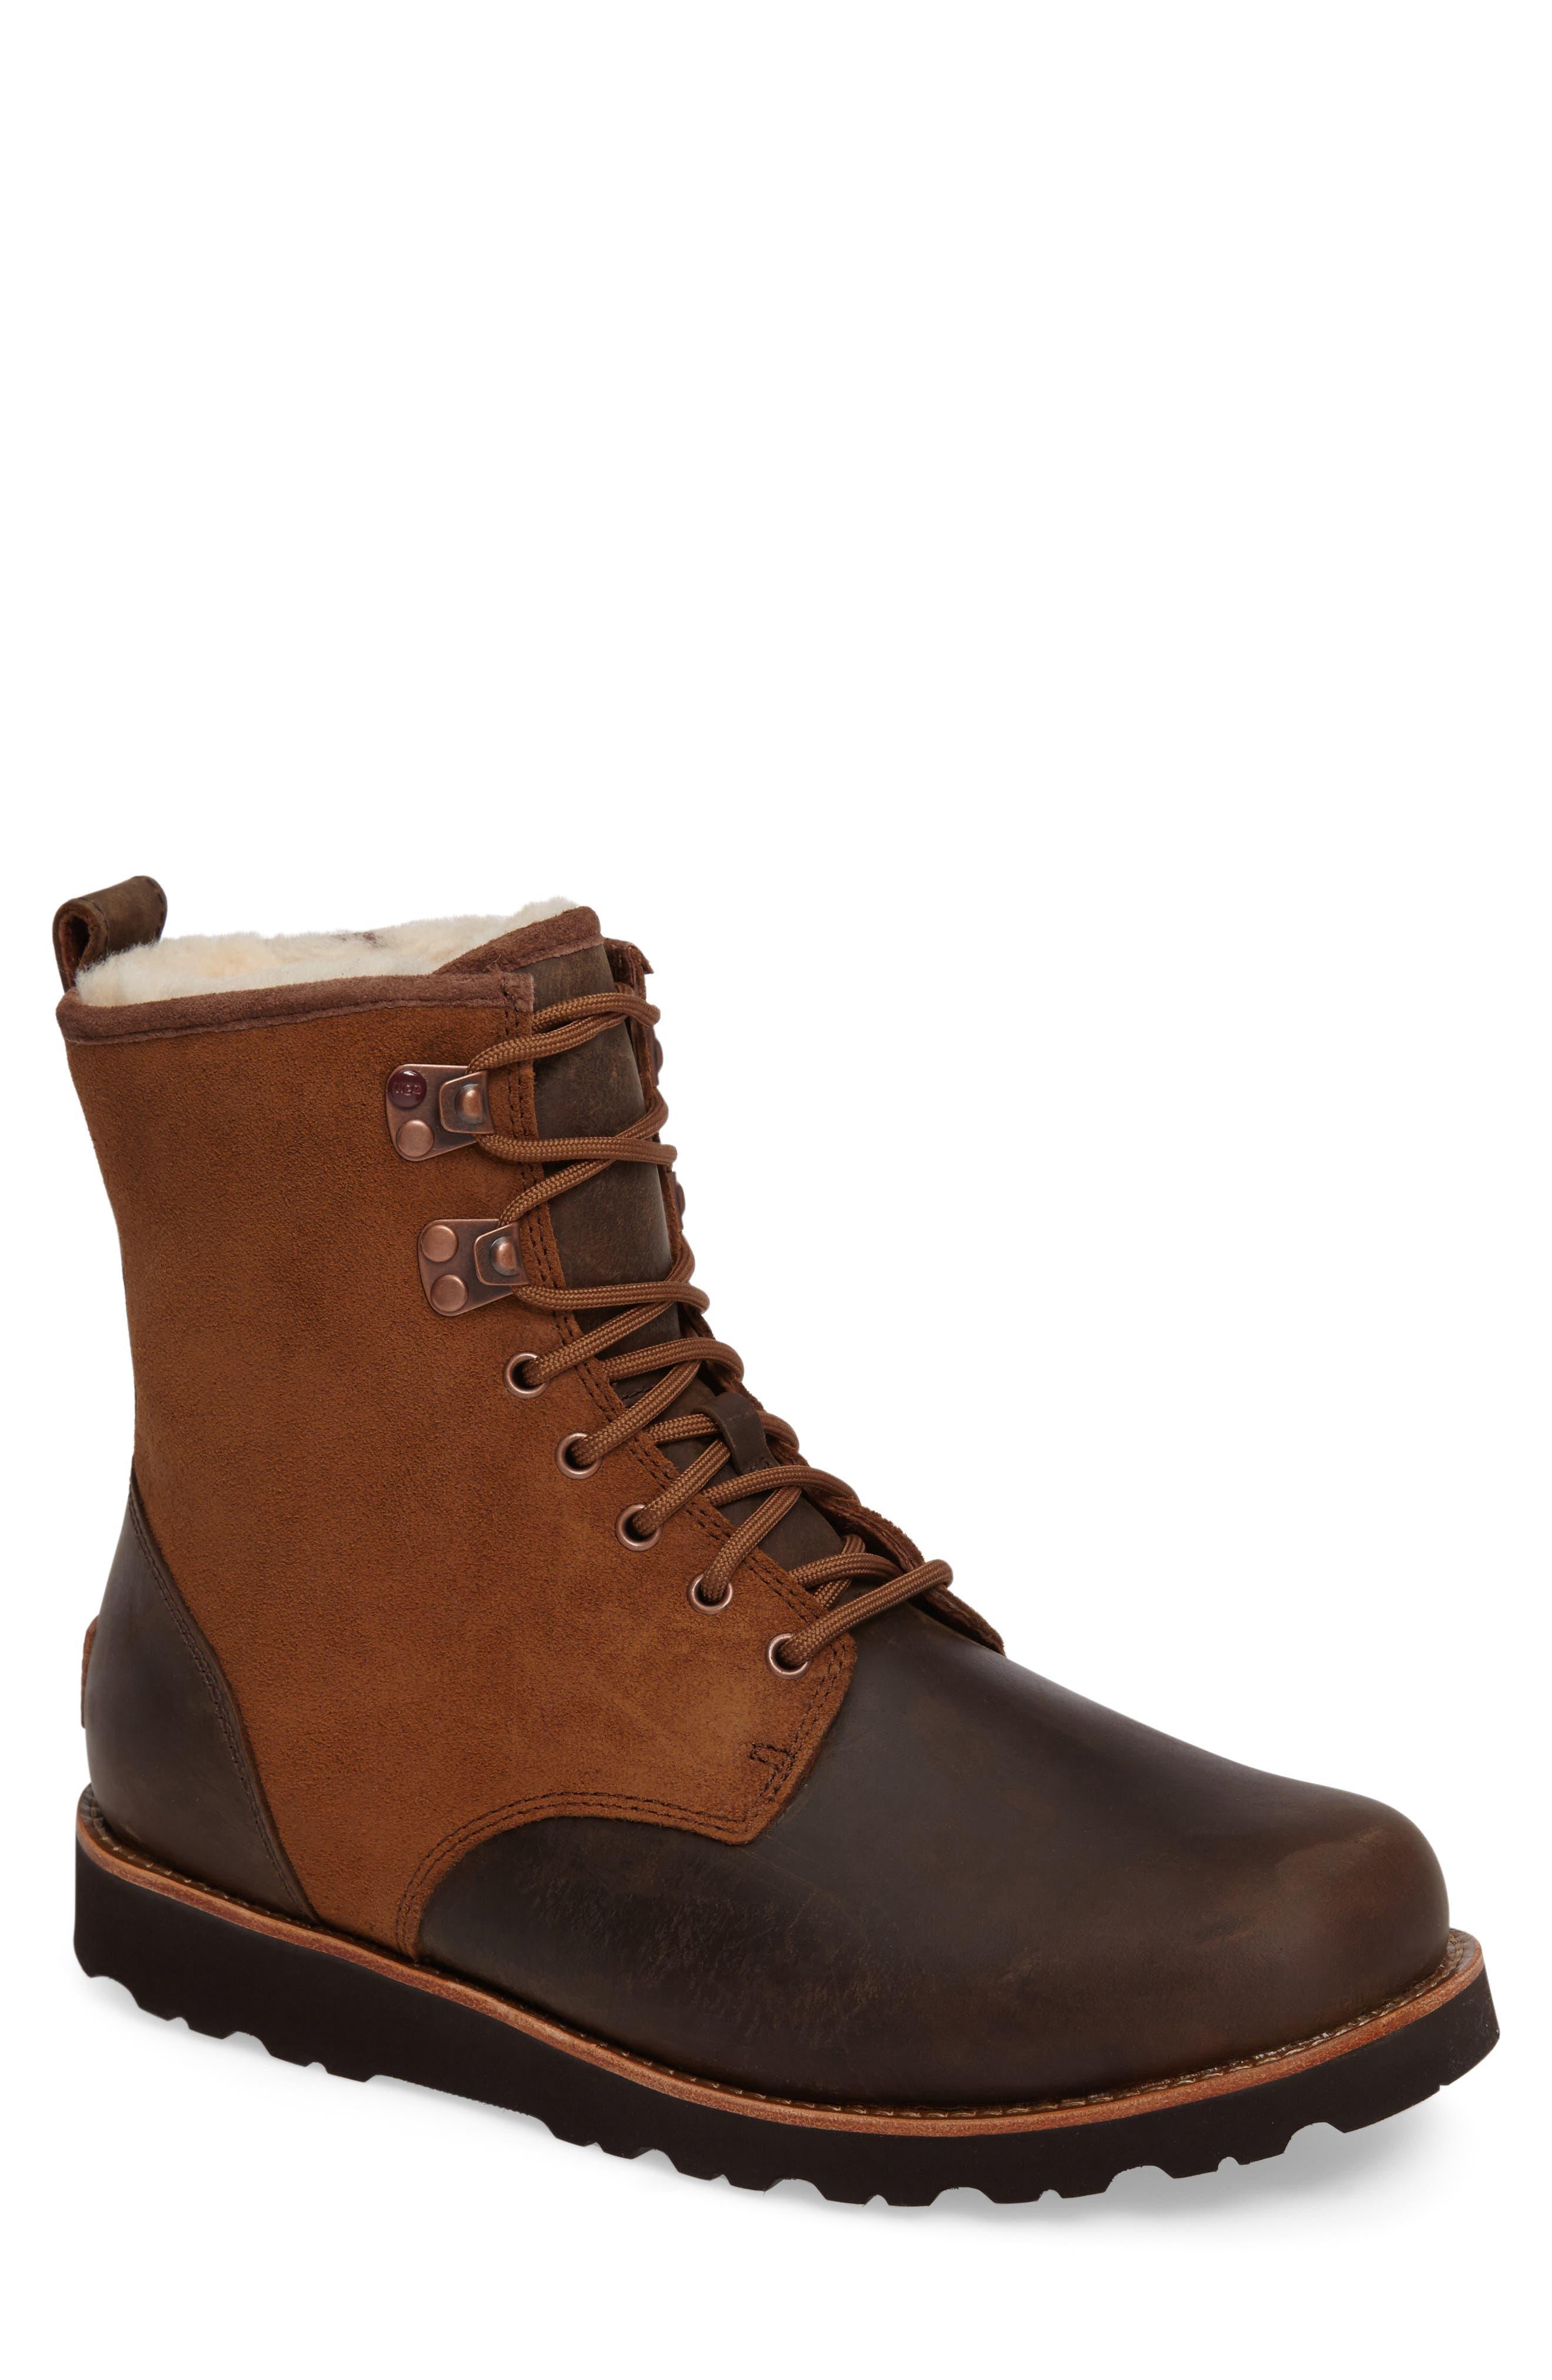 Main Image - UGG® Hannen Plain Toe Waterproof Boot with Genuine Shearling (Men)